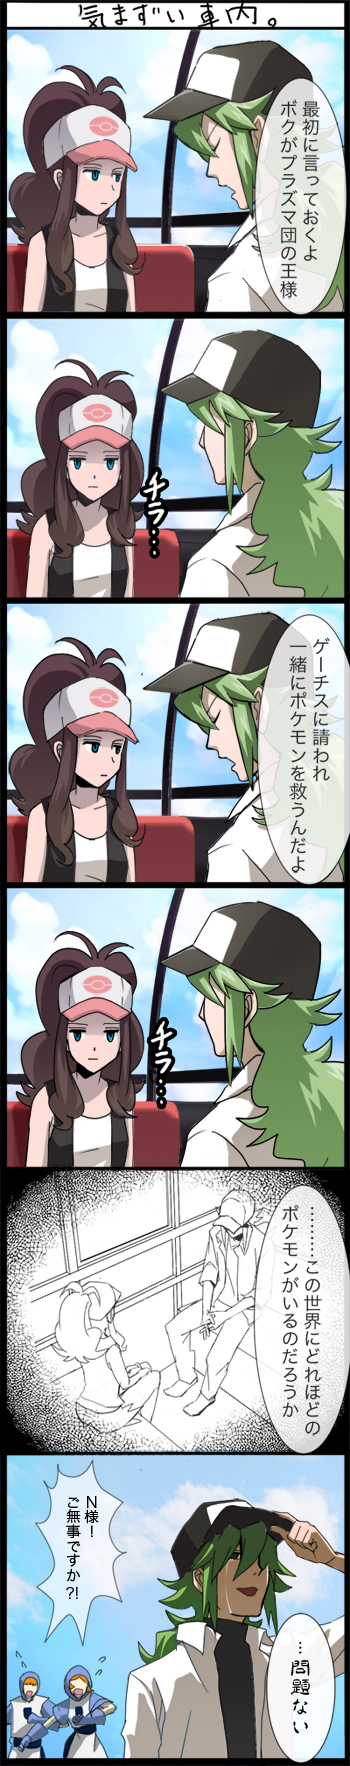 1boy 1girl black_hat brown_hair ferriswheel green_hair long_hair long_sleeves n_(pokemon) pokemon pokemon_(bw) pokemon_(game) ponytail shirt translation_request white_hat white_shirt